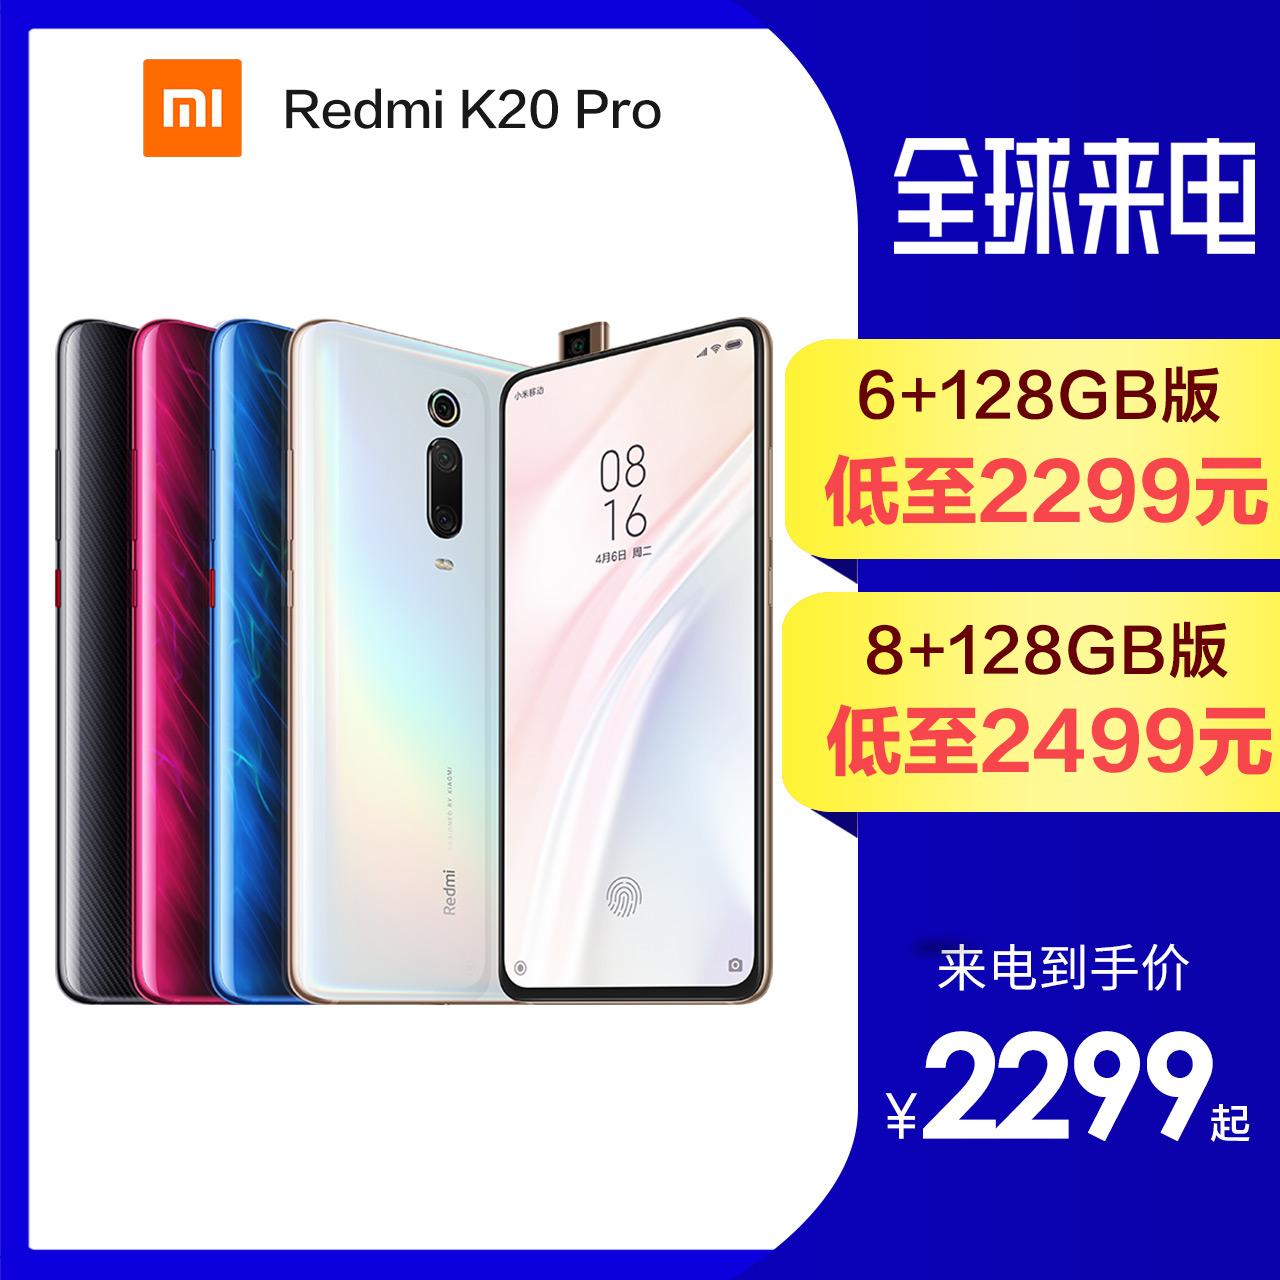 Redmi K20 Pro 128G直降300